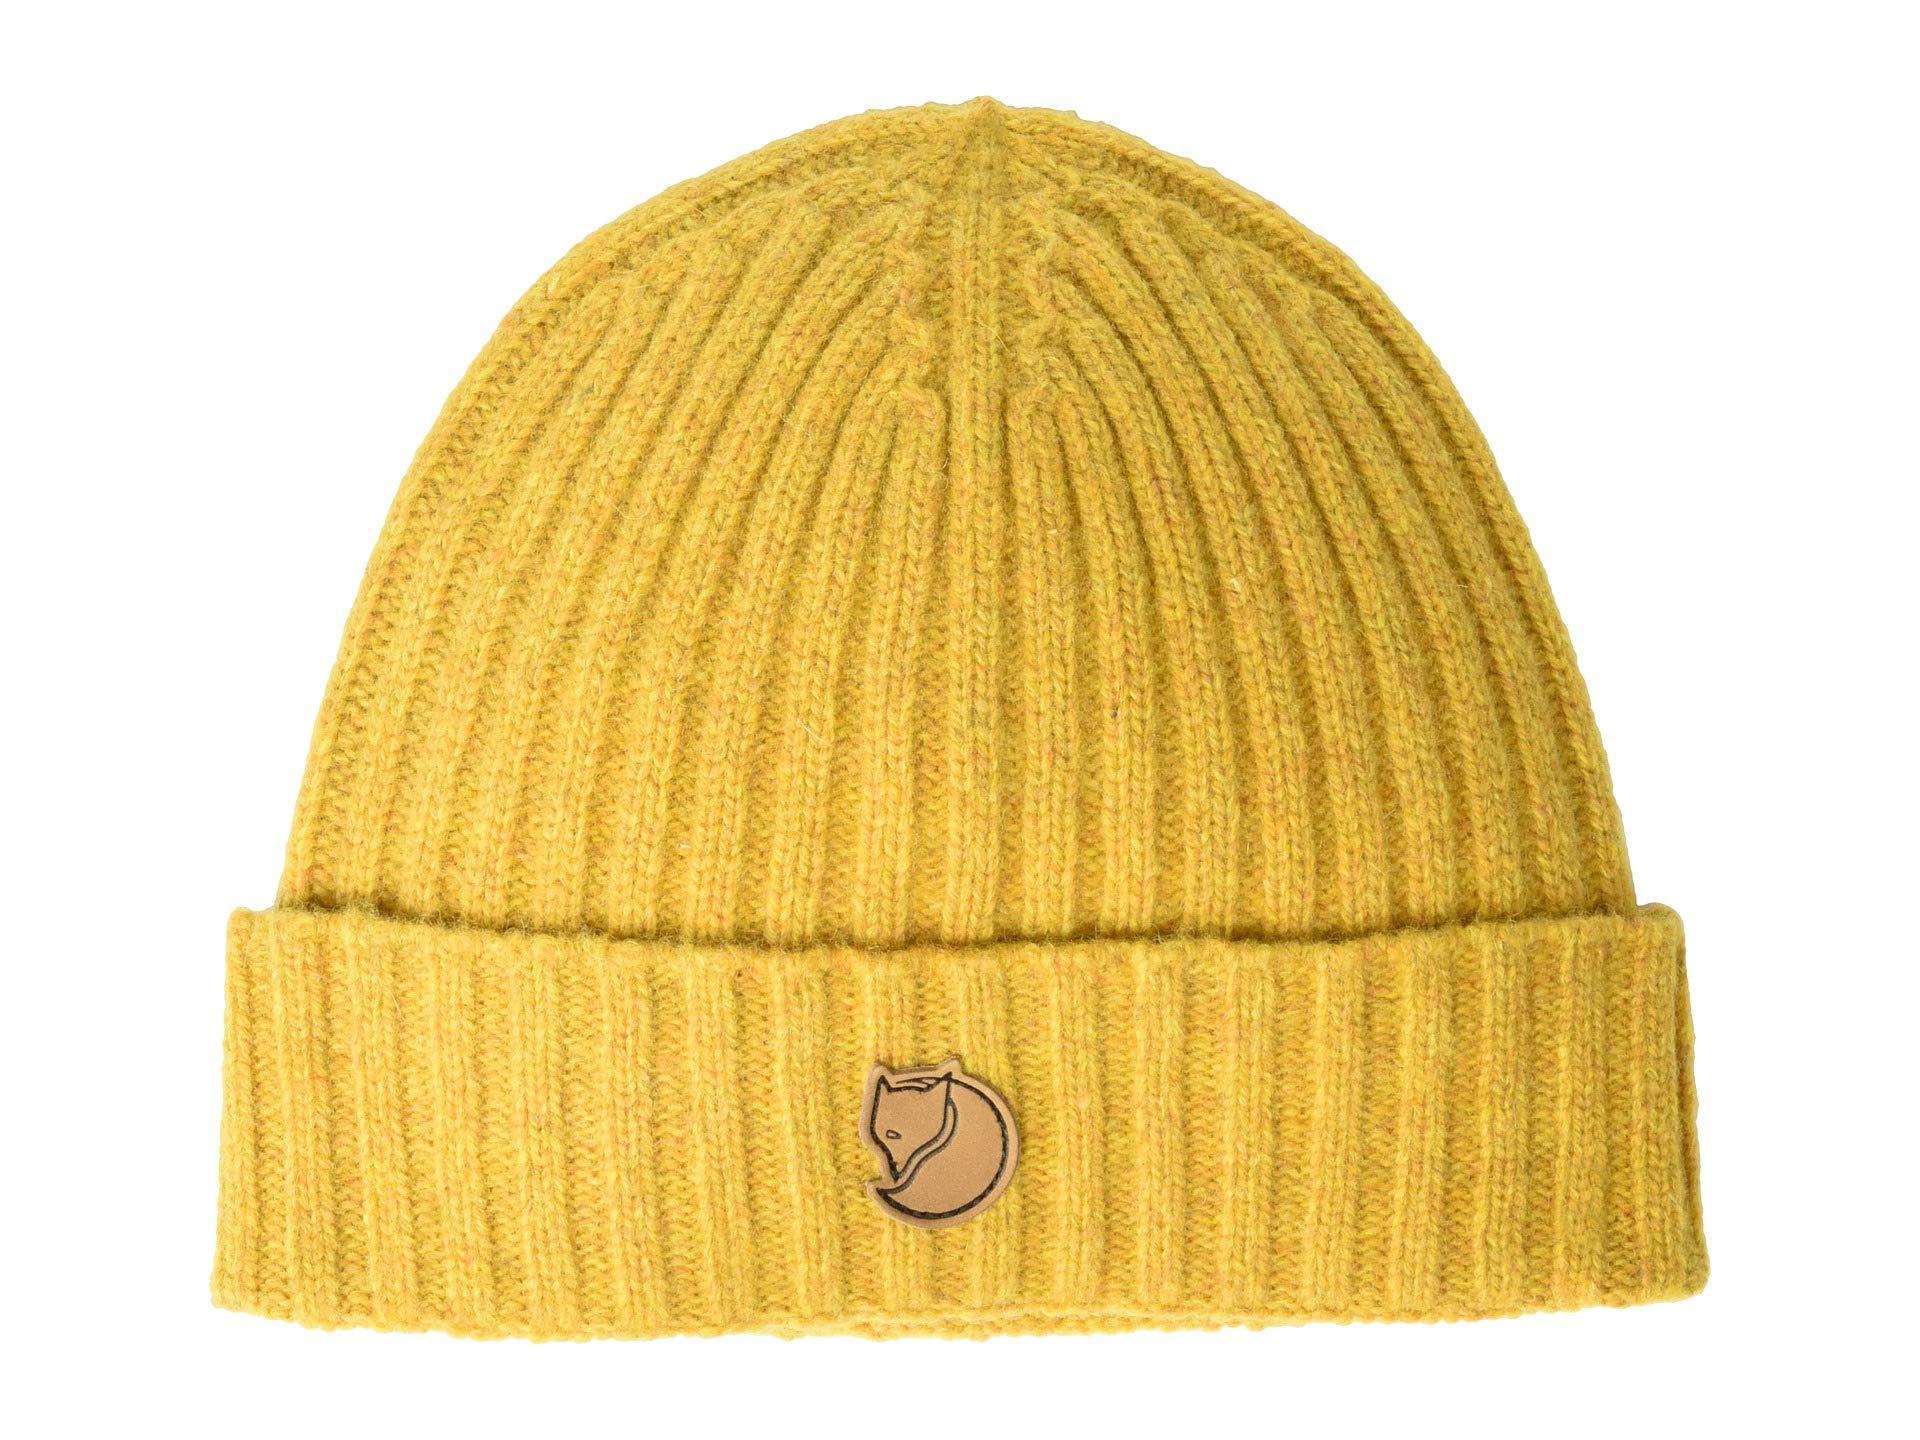 1bab57bb4b200 Fjallraven Re-wool Hat (acorn) Caps in Yellow - Lyst